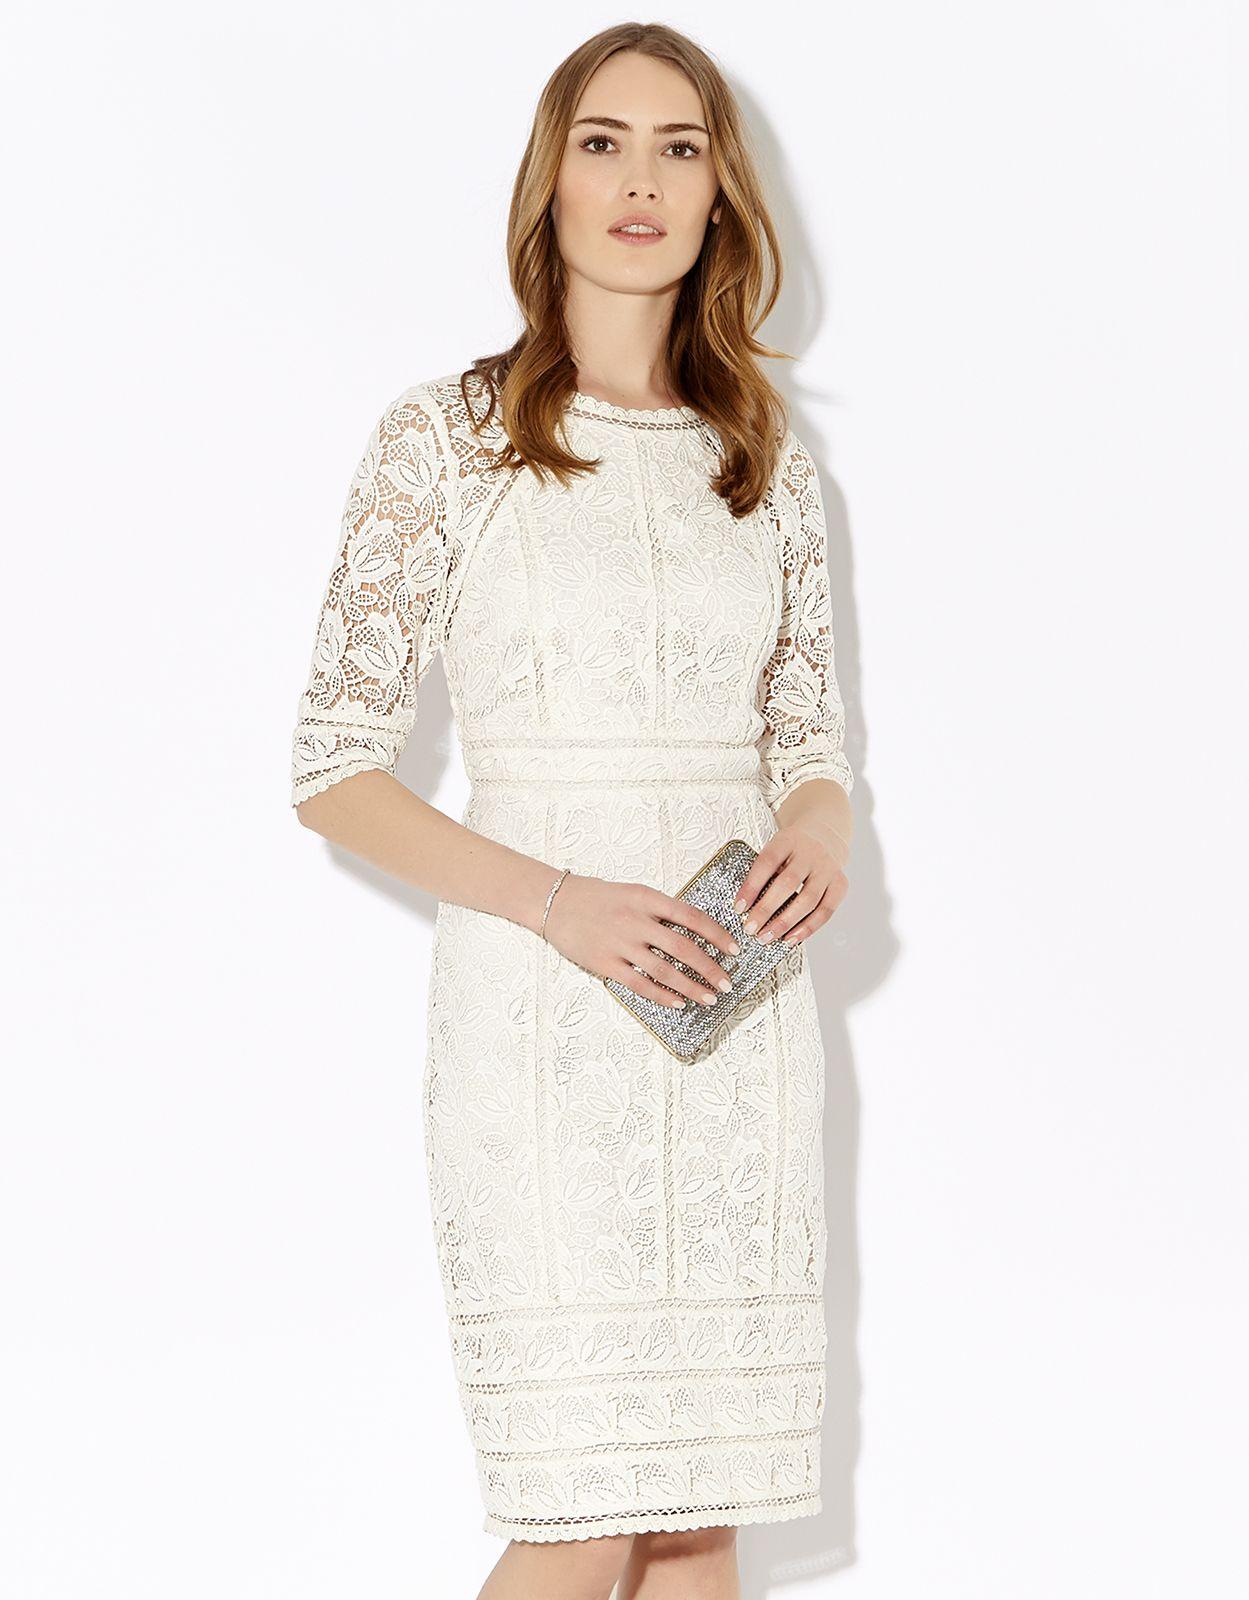 Elvie Dress Ivory Monsoon Replikates Dresses